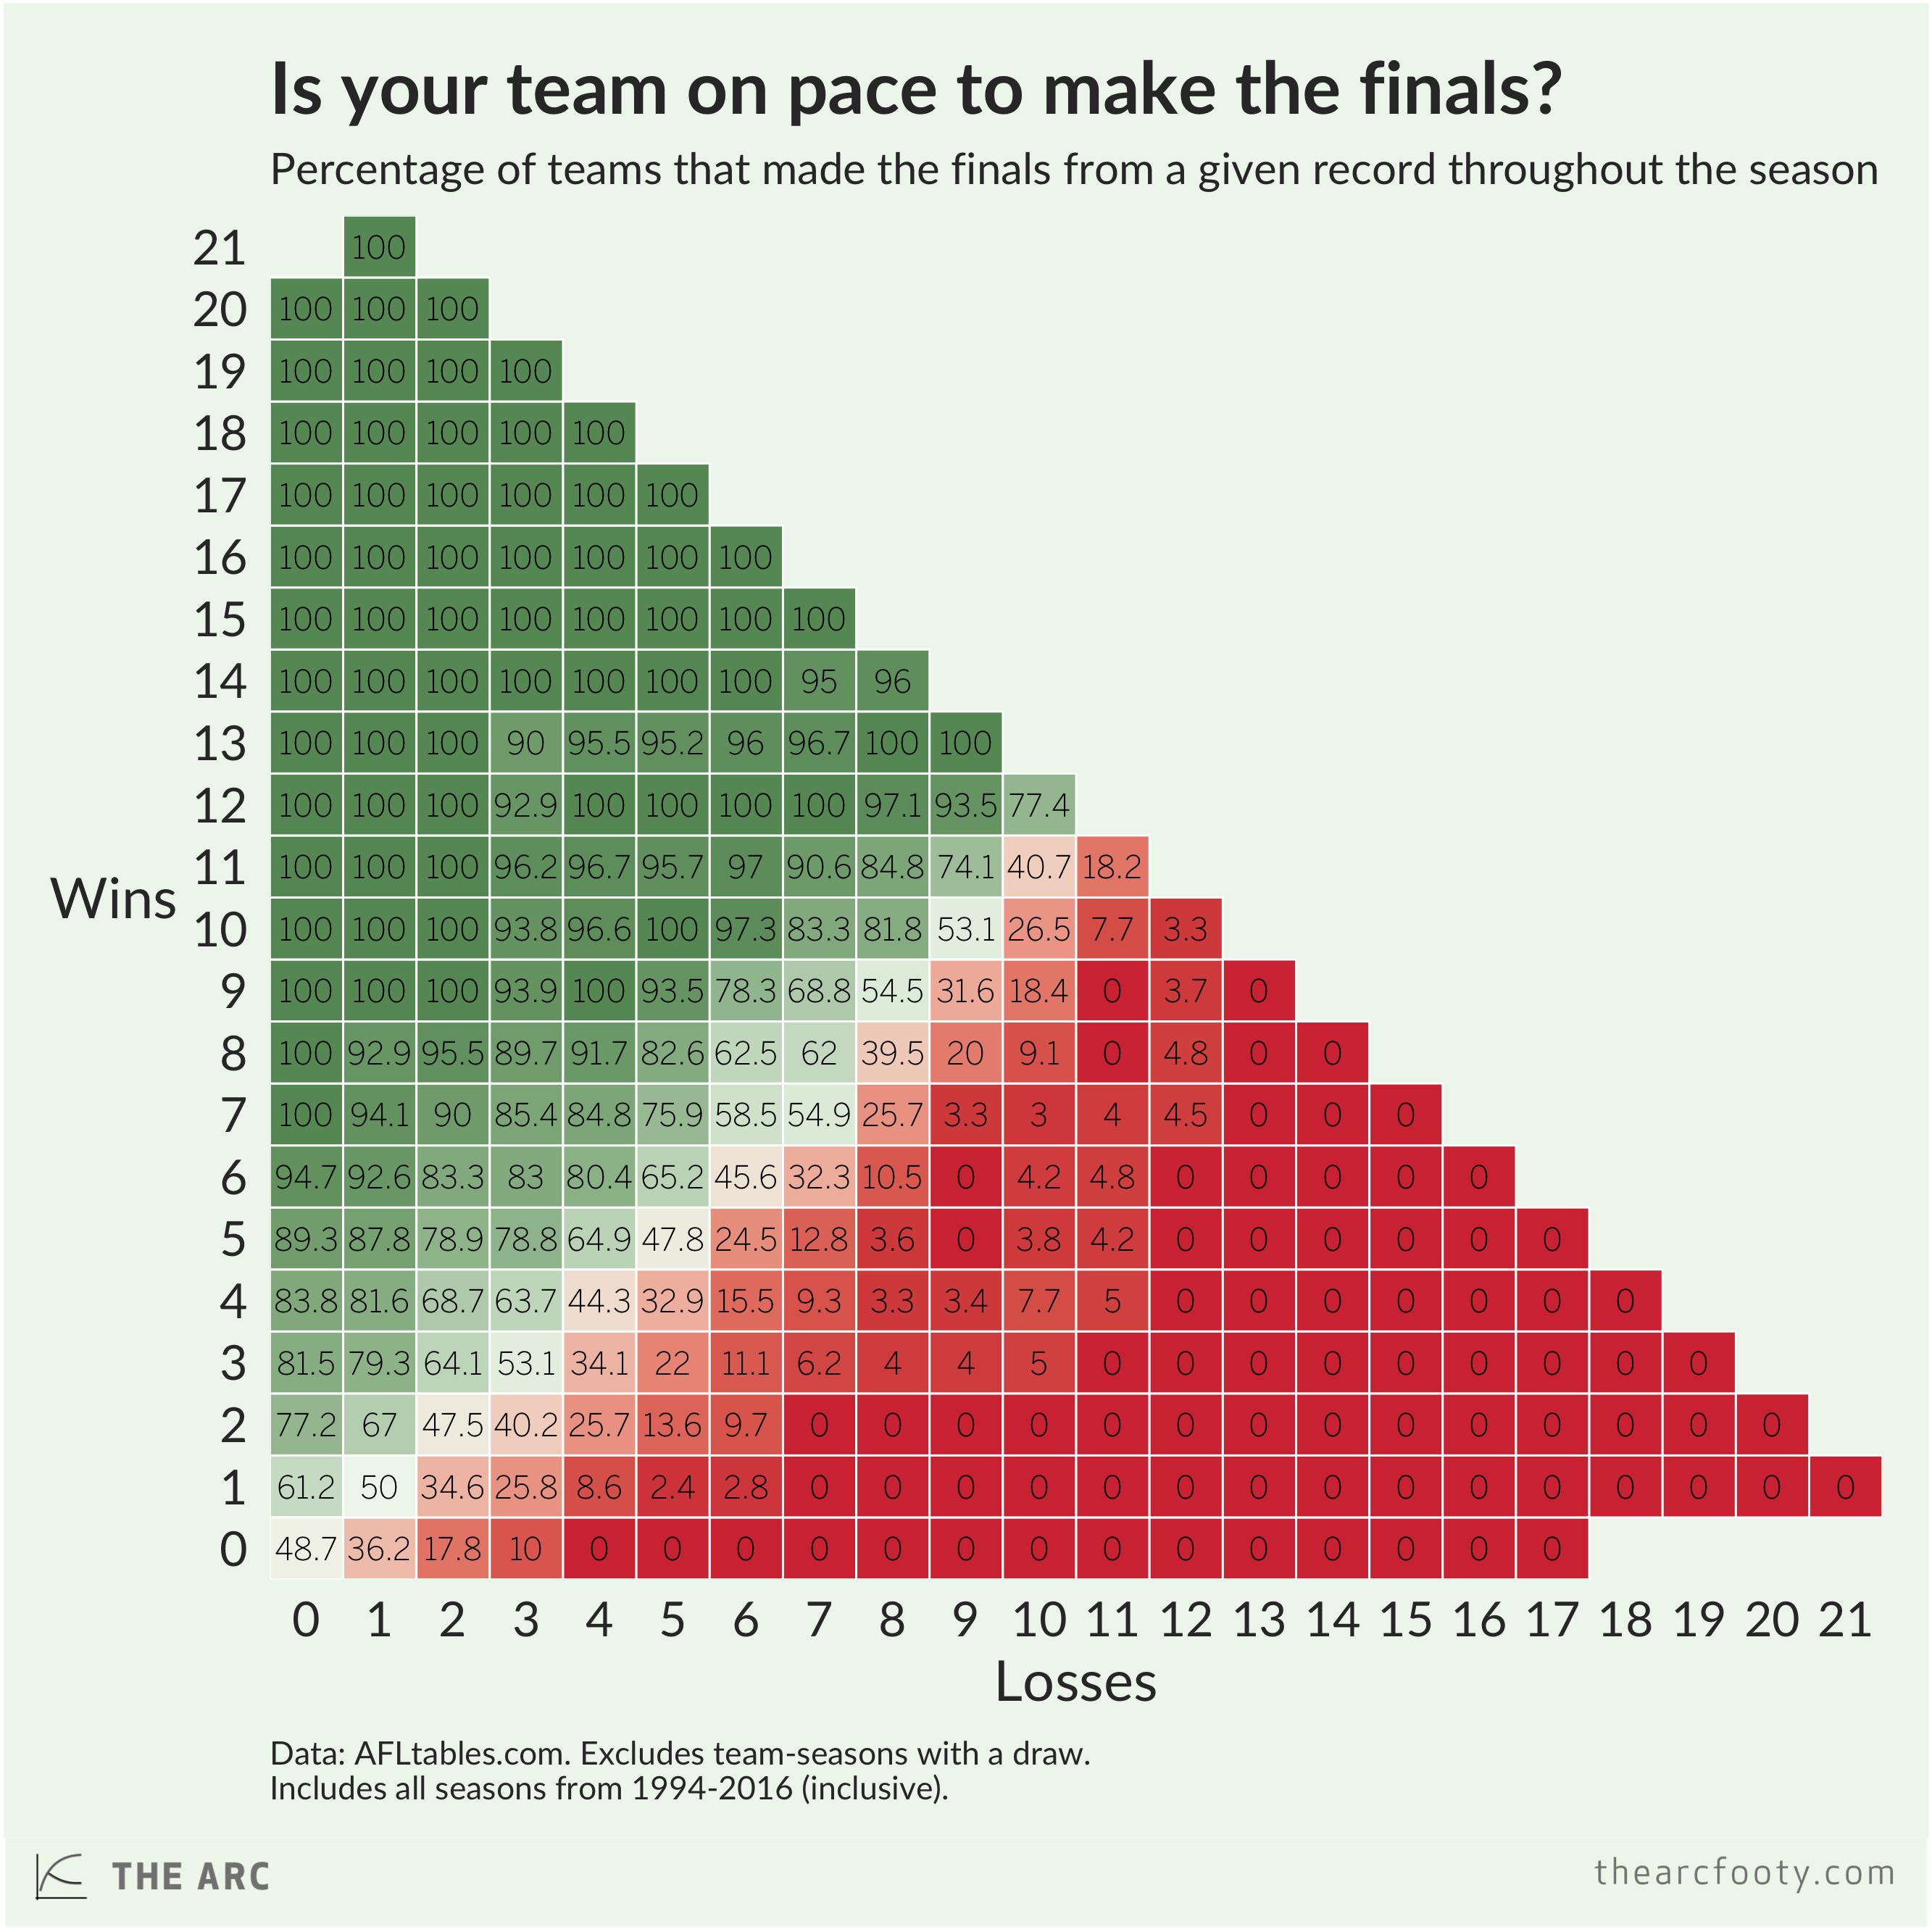 Likelihood of making the finals